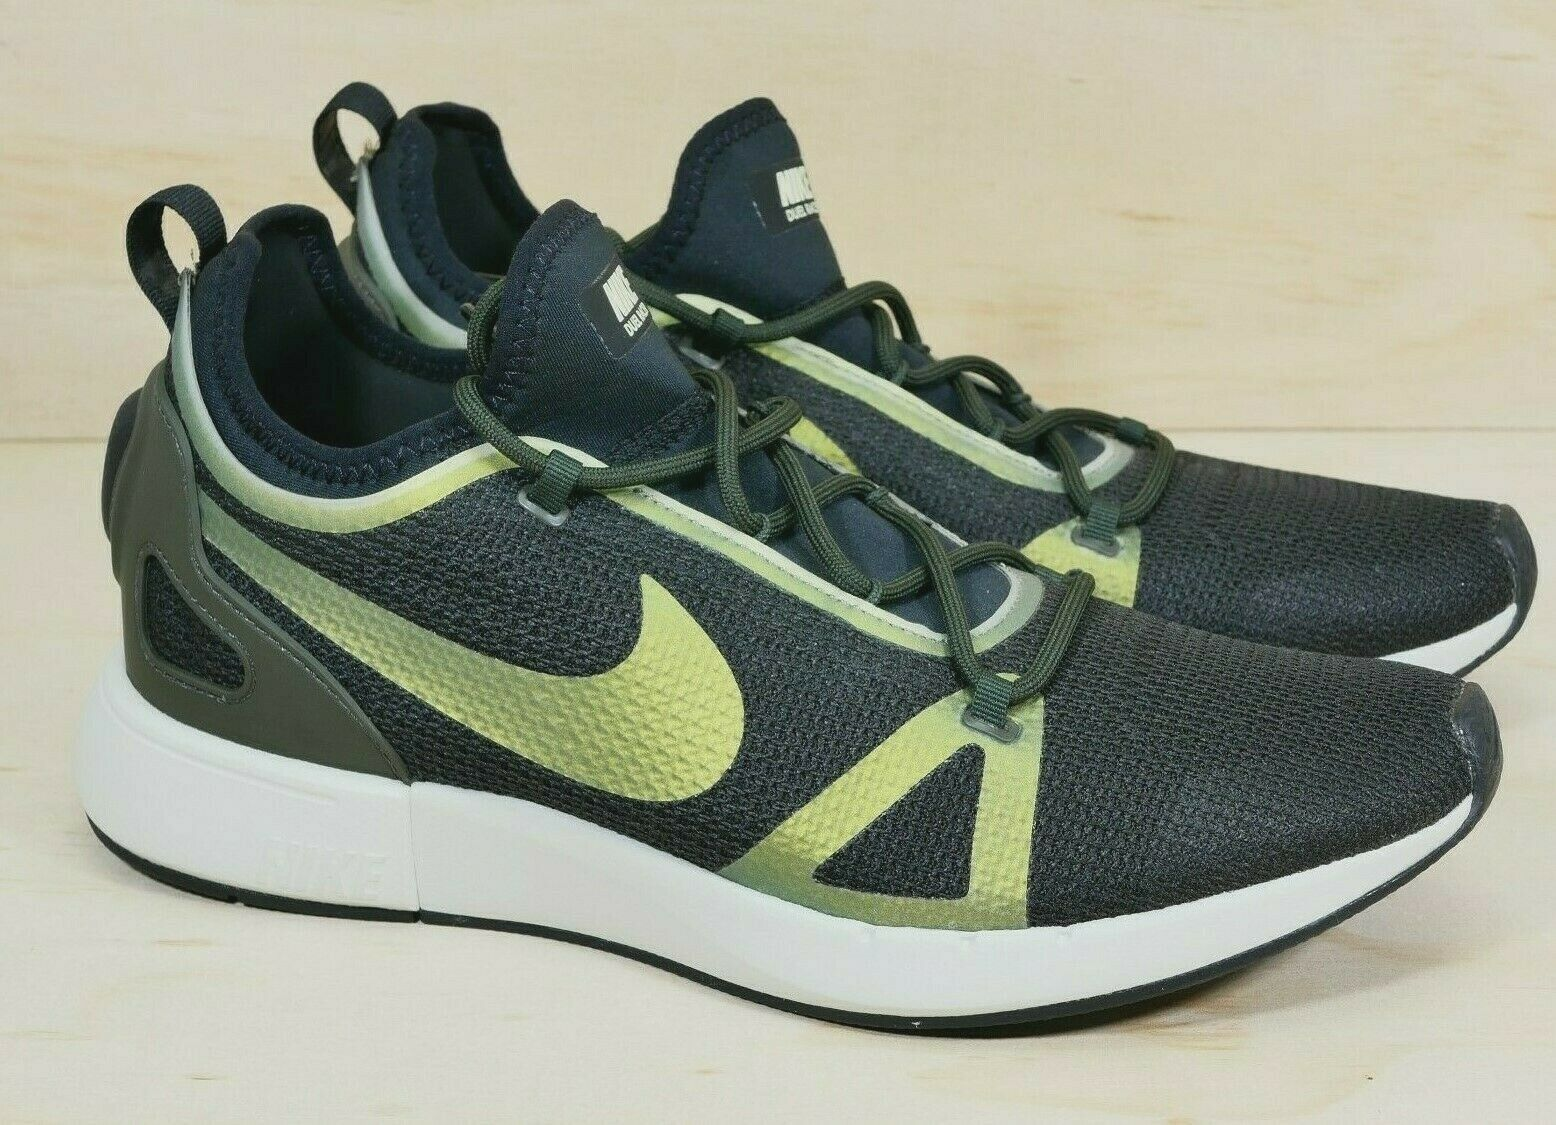 online store 57e63 28619 Nike Duel Duel Duel Racer Athletic Black Olive White Mens Size 11 M shoes  918228-